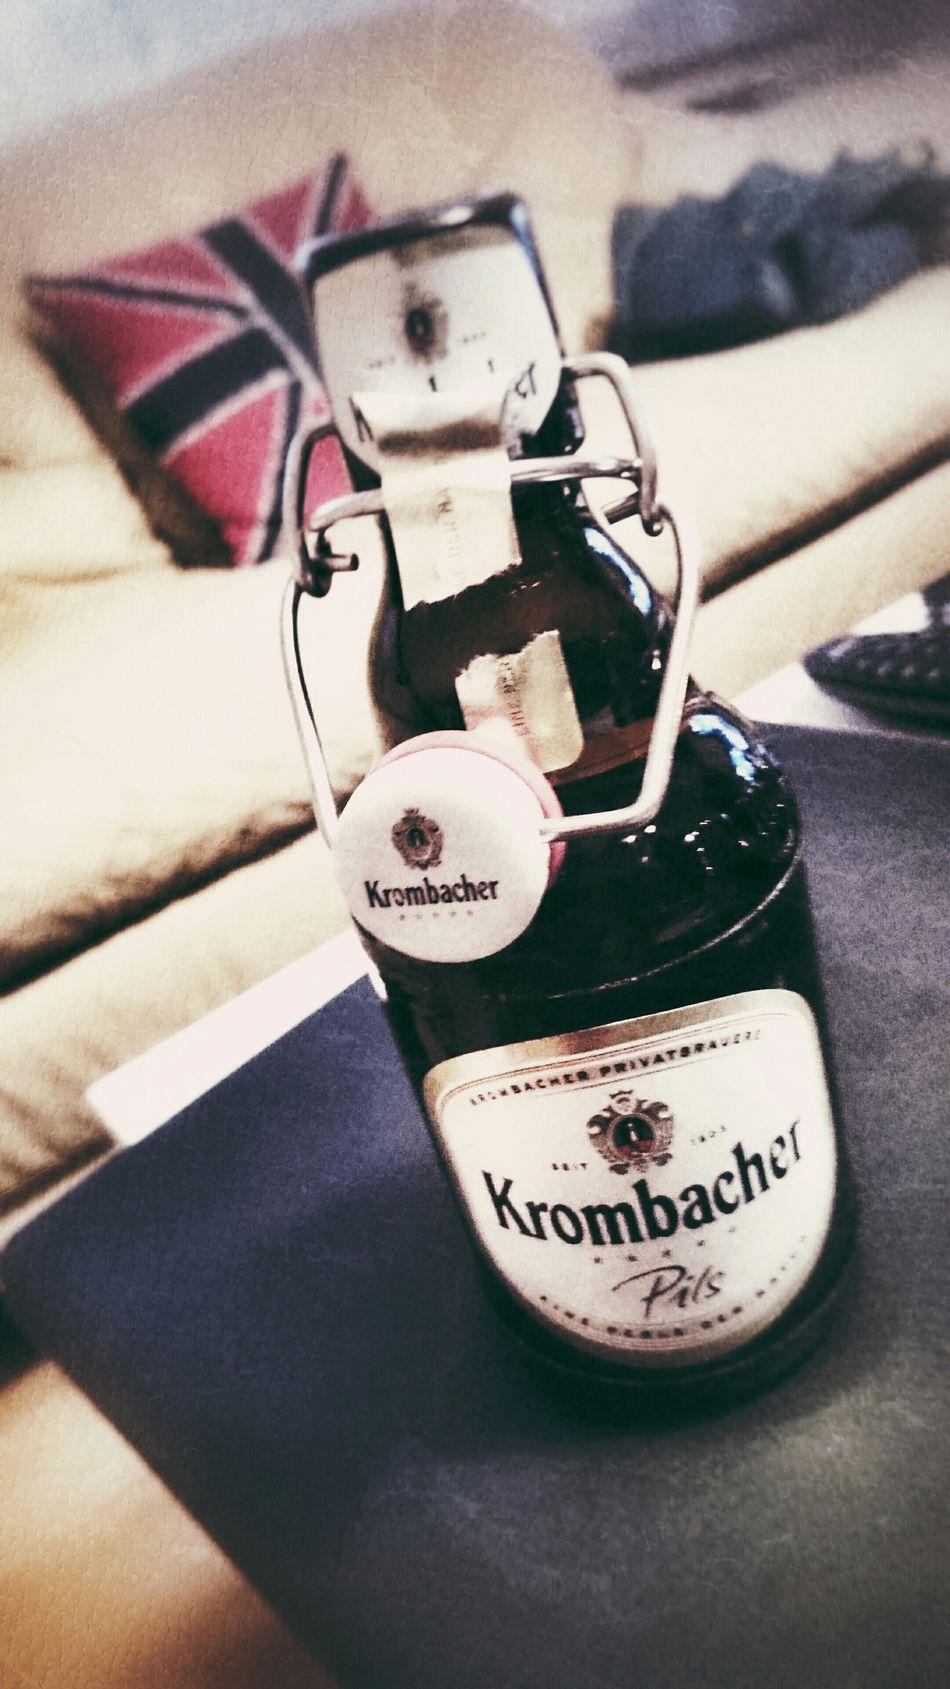 A Taste Of Life Relaxing Krombacher I ❤ Beer Beer Oldtimer Sony Xperia Z3 Mysmartphonelife Prost Drinking Beer